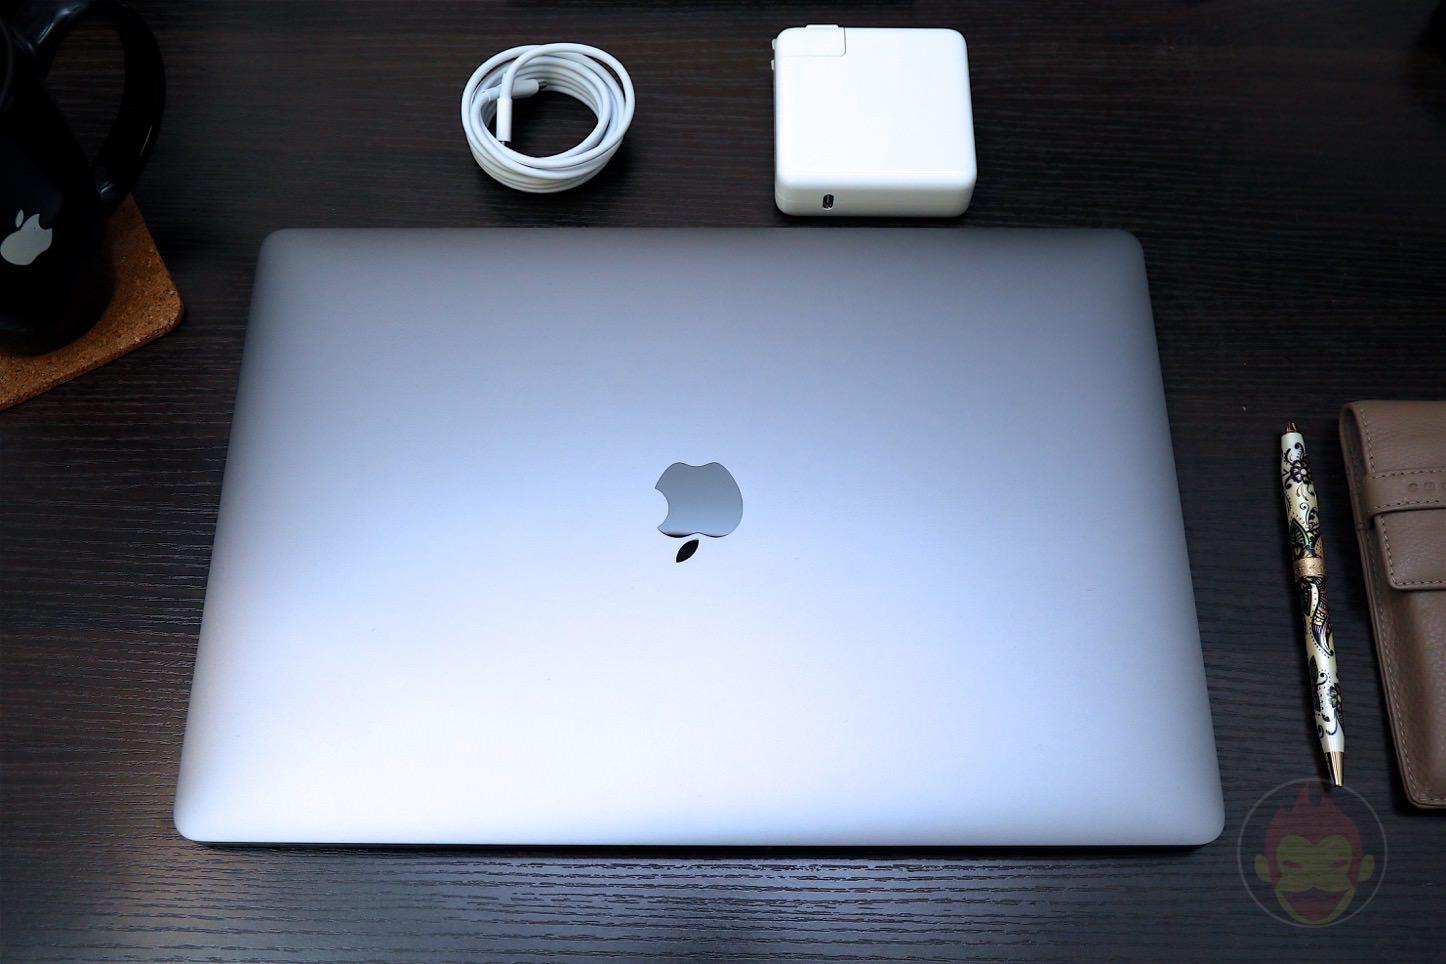 MacBook-Pro-Late-2016-15inch-model-01.jpg